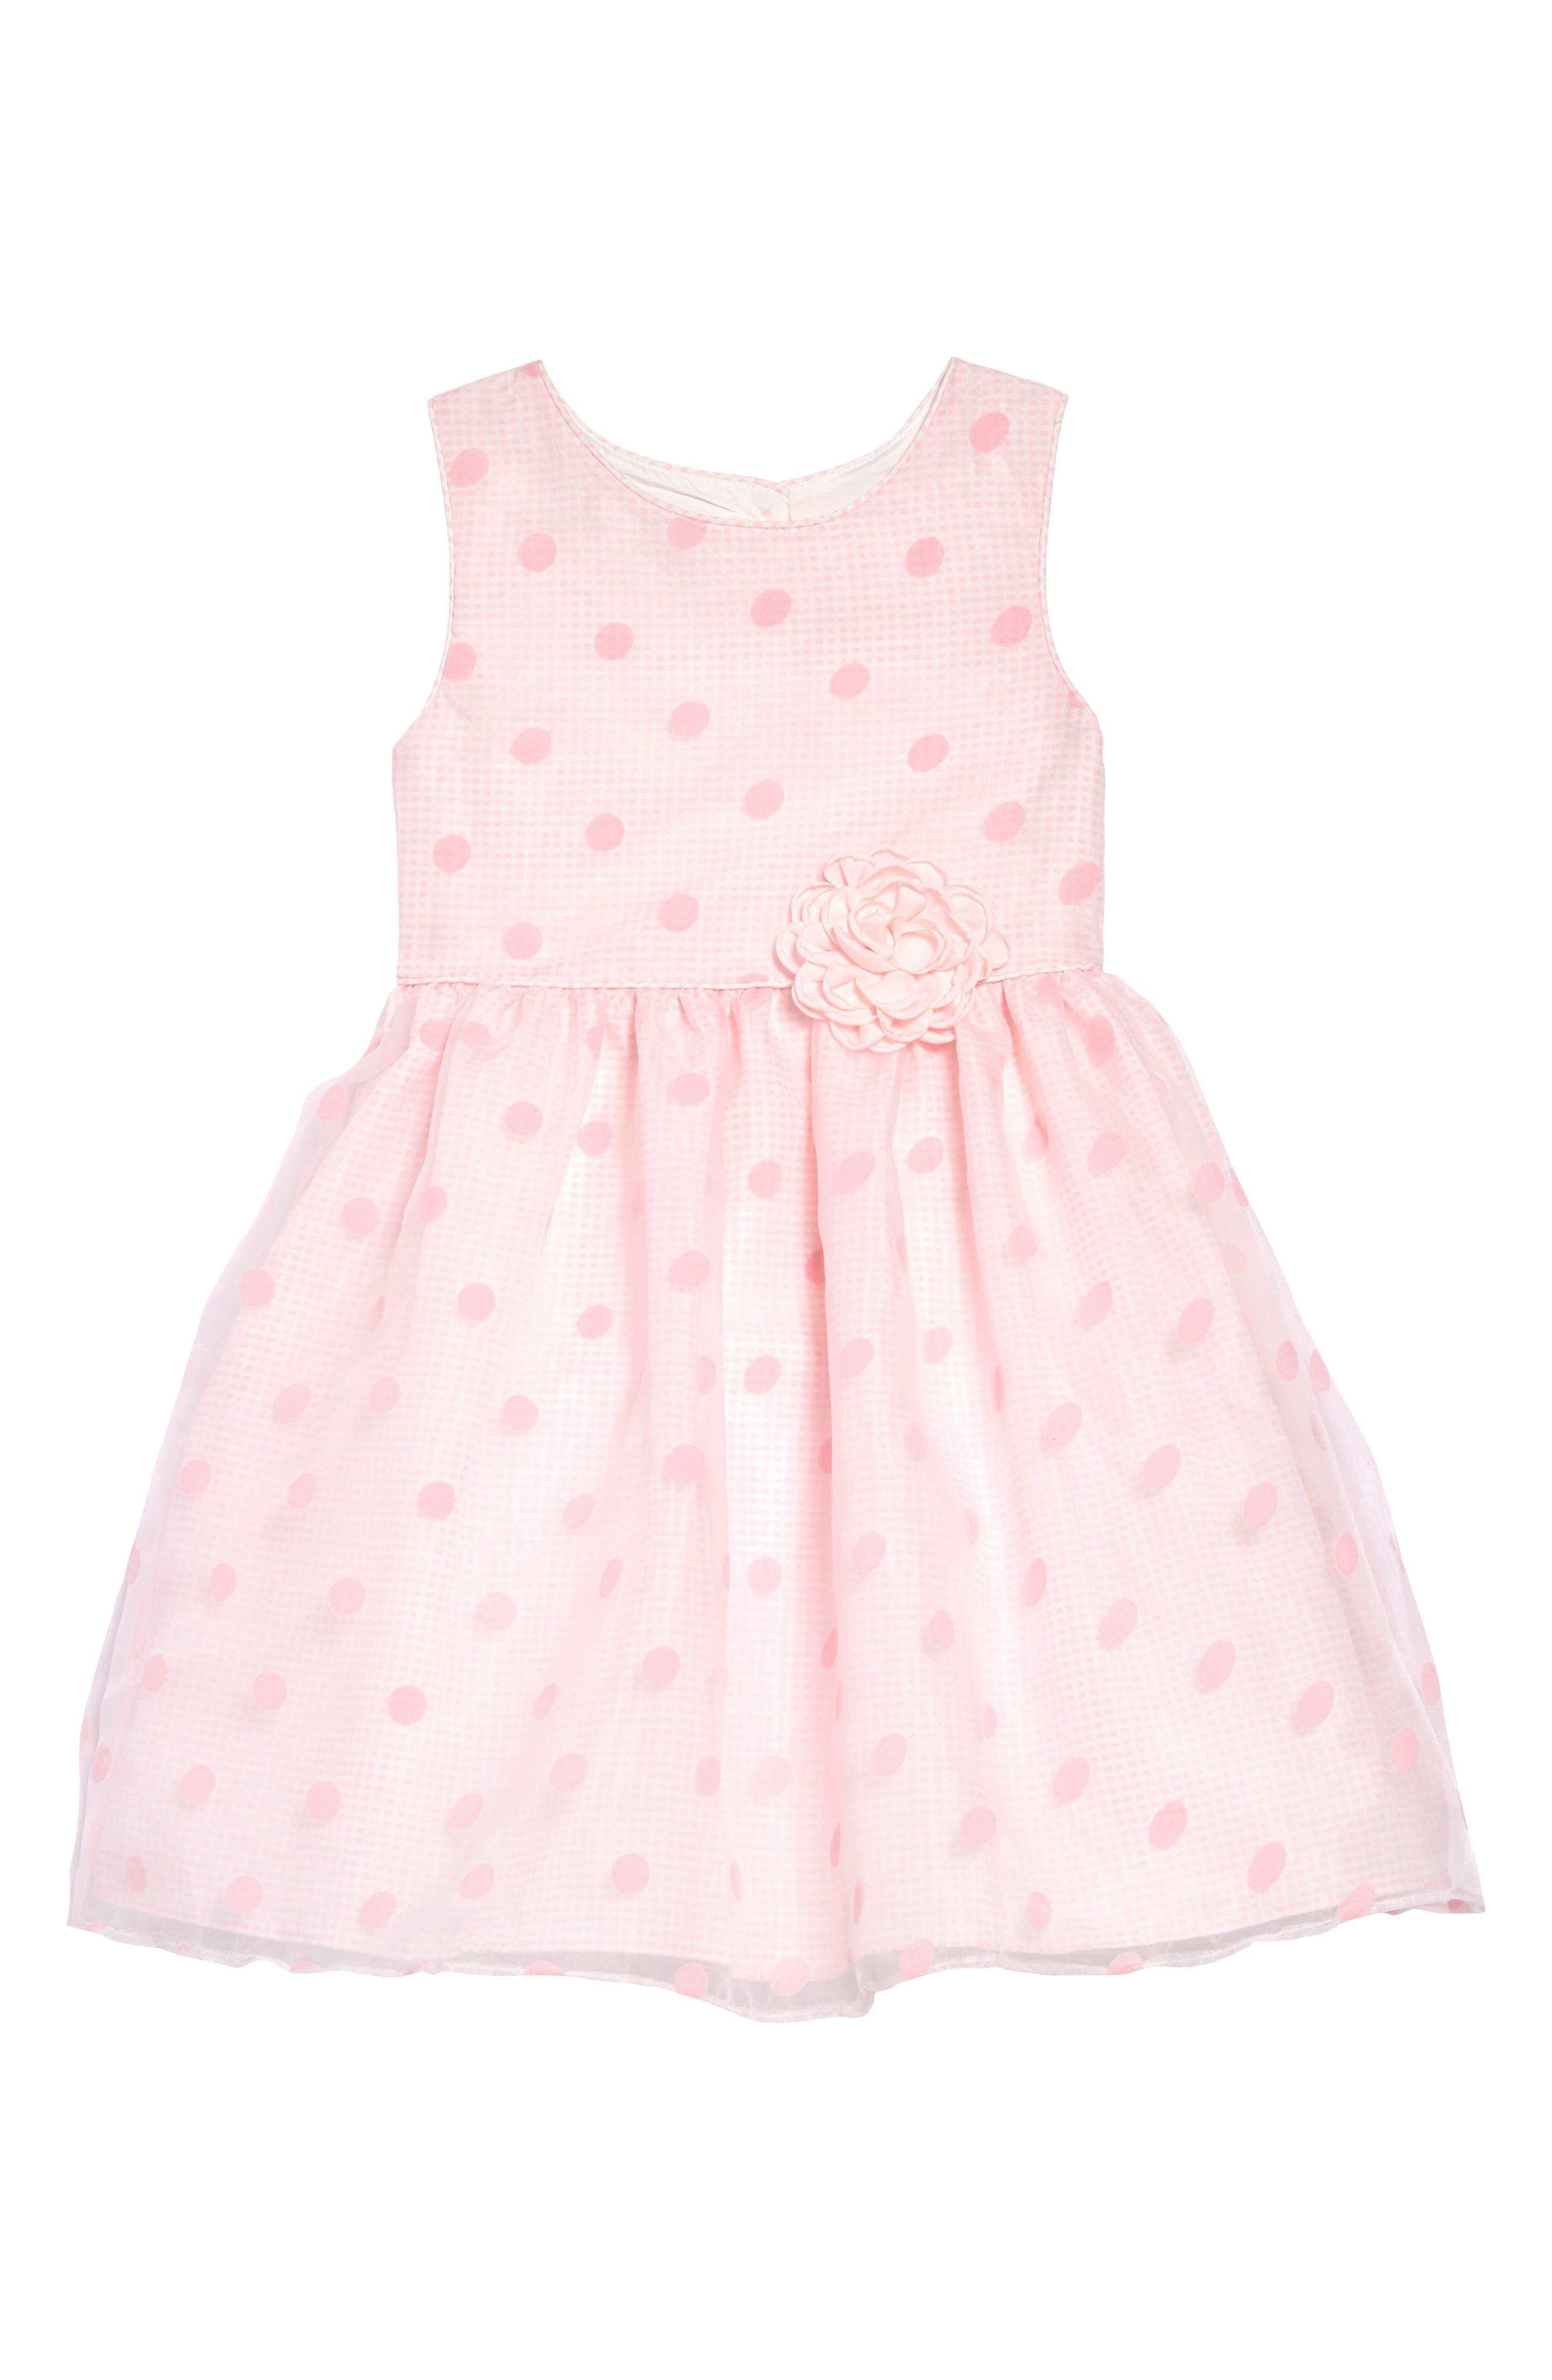 FRAIS Dot Overlay Gingham Dress, Main, color, PINK